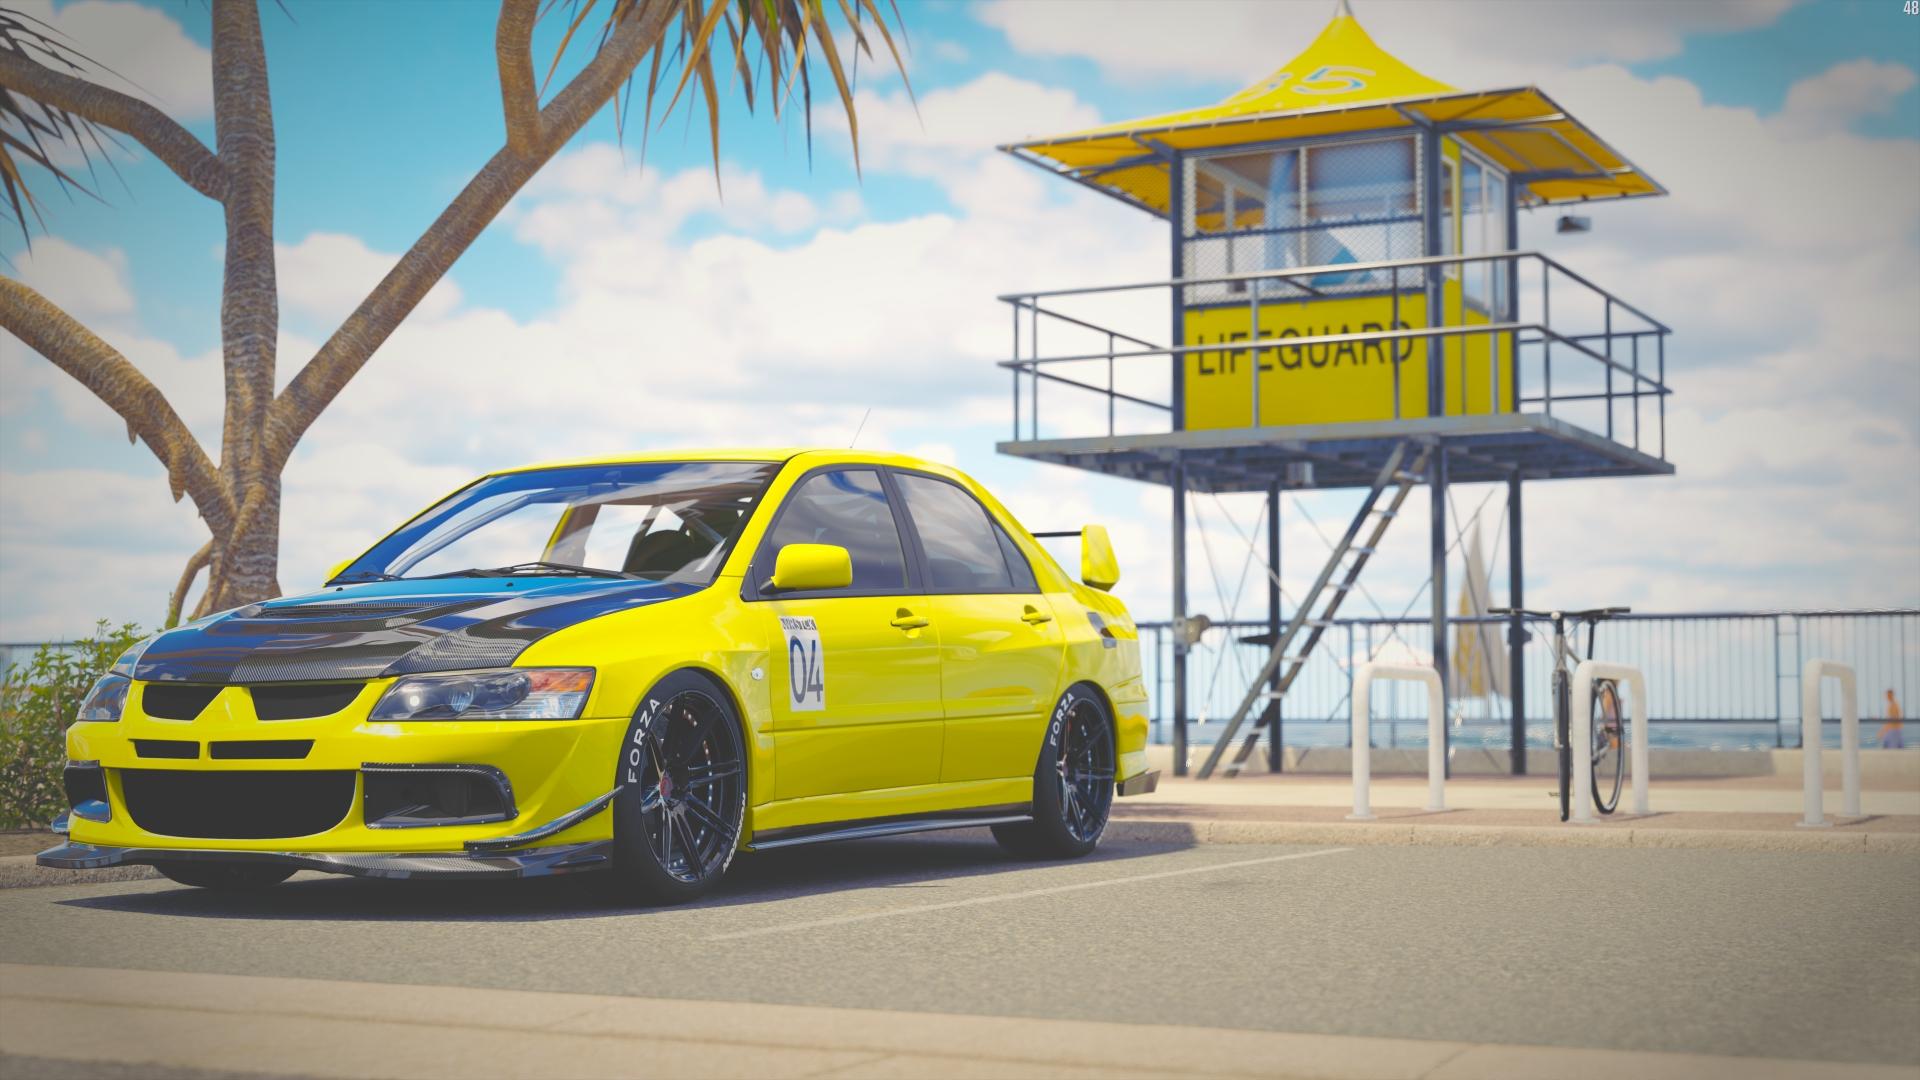 Wallpaper Forza Horizon 3, video game, Mitsubishi Lancer Evolution, car